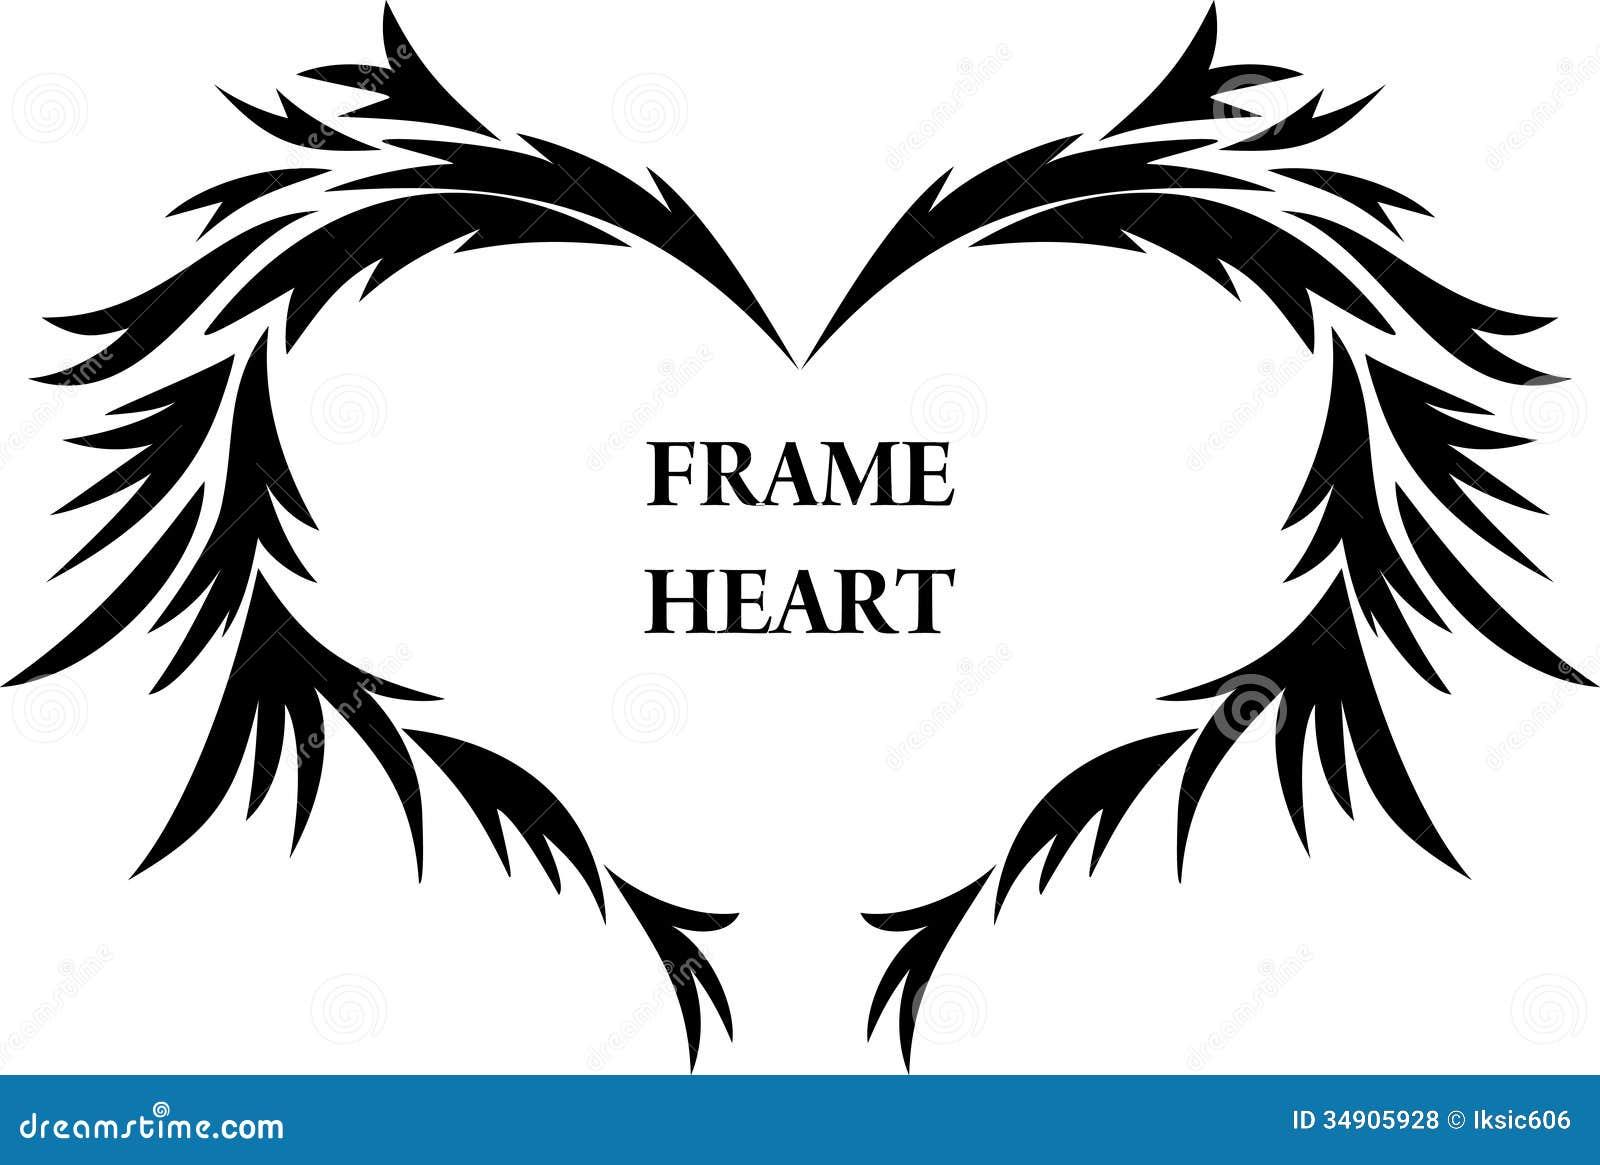 Heart Royalty Free Stock Photos - Image: 34905928